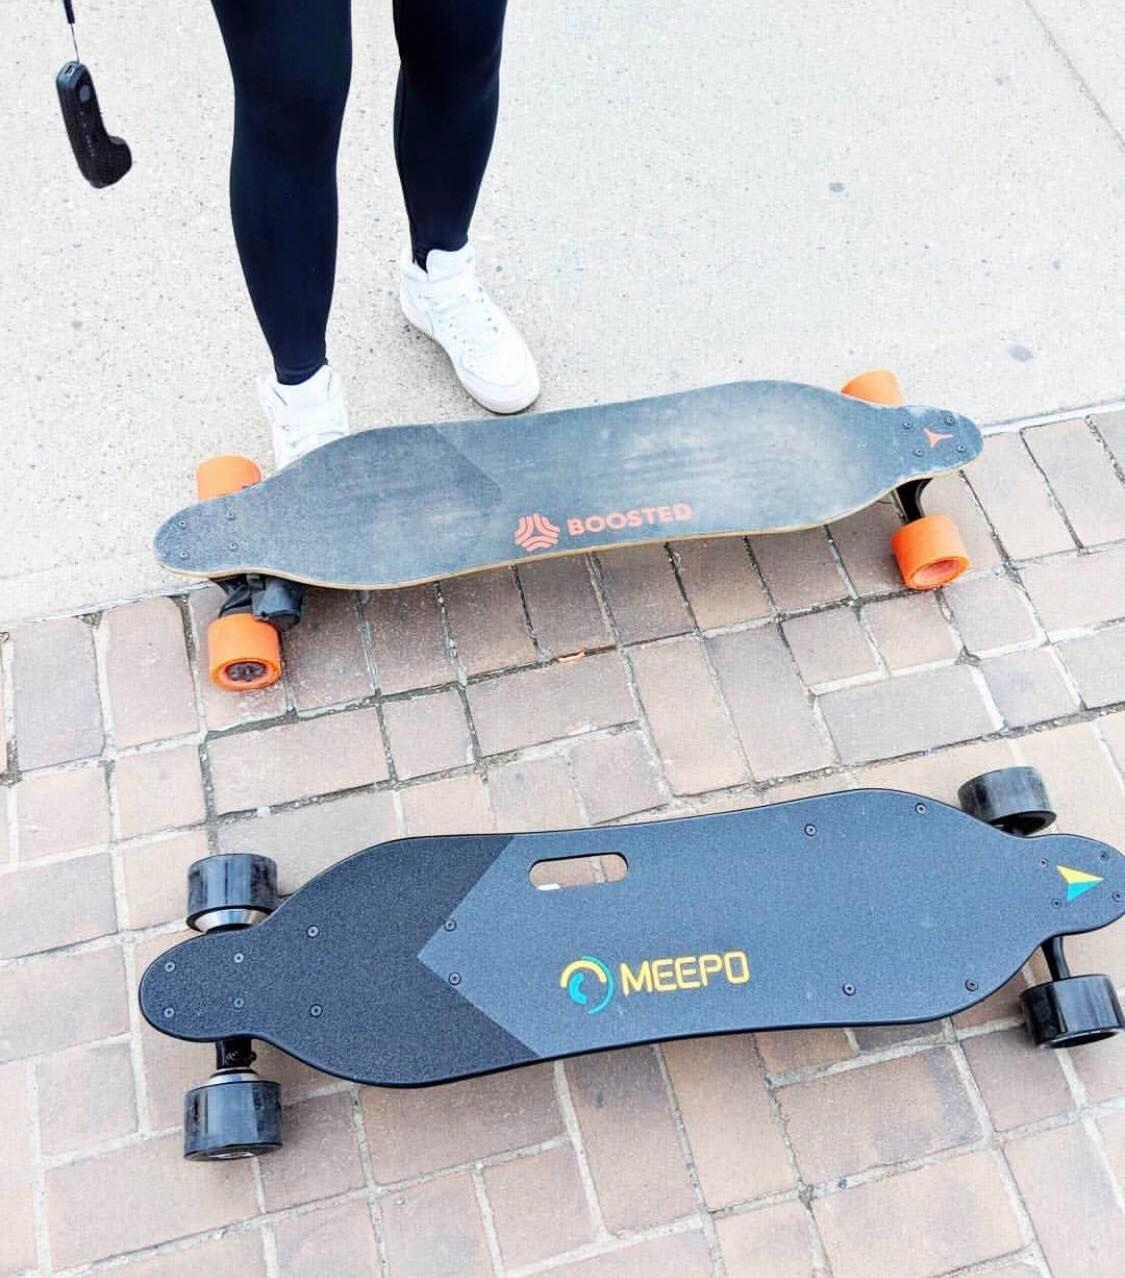 Best Budget Electric Skateboard